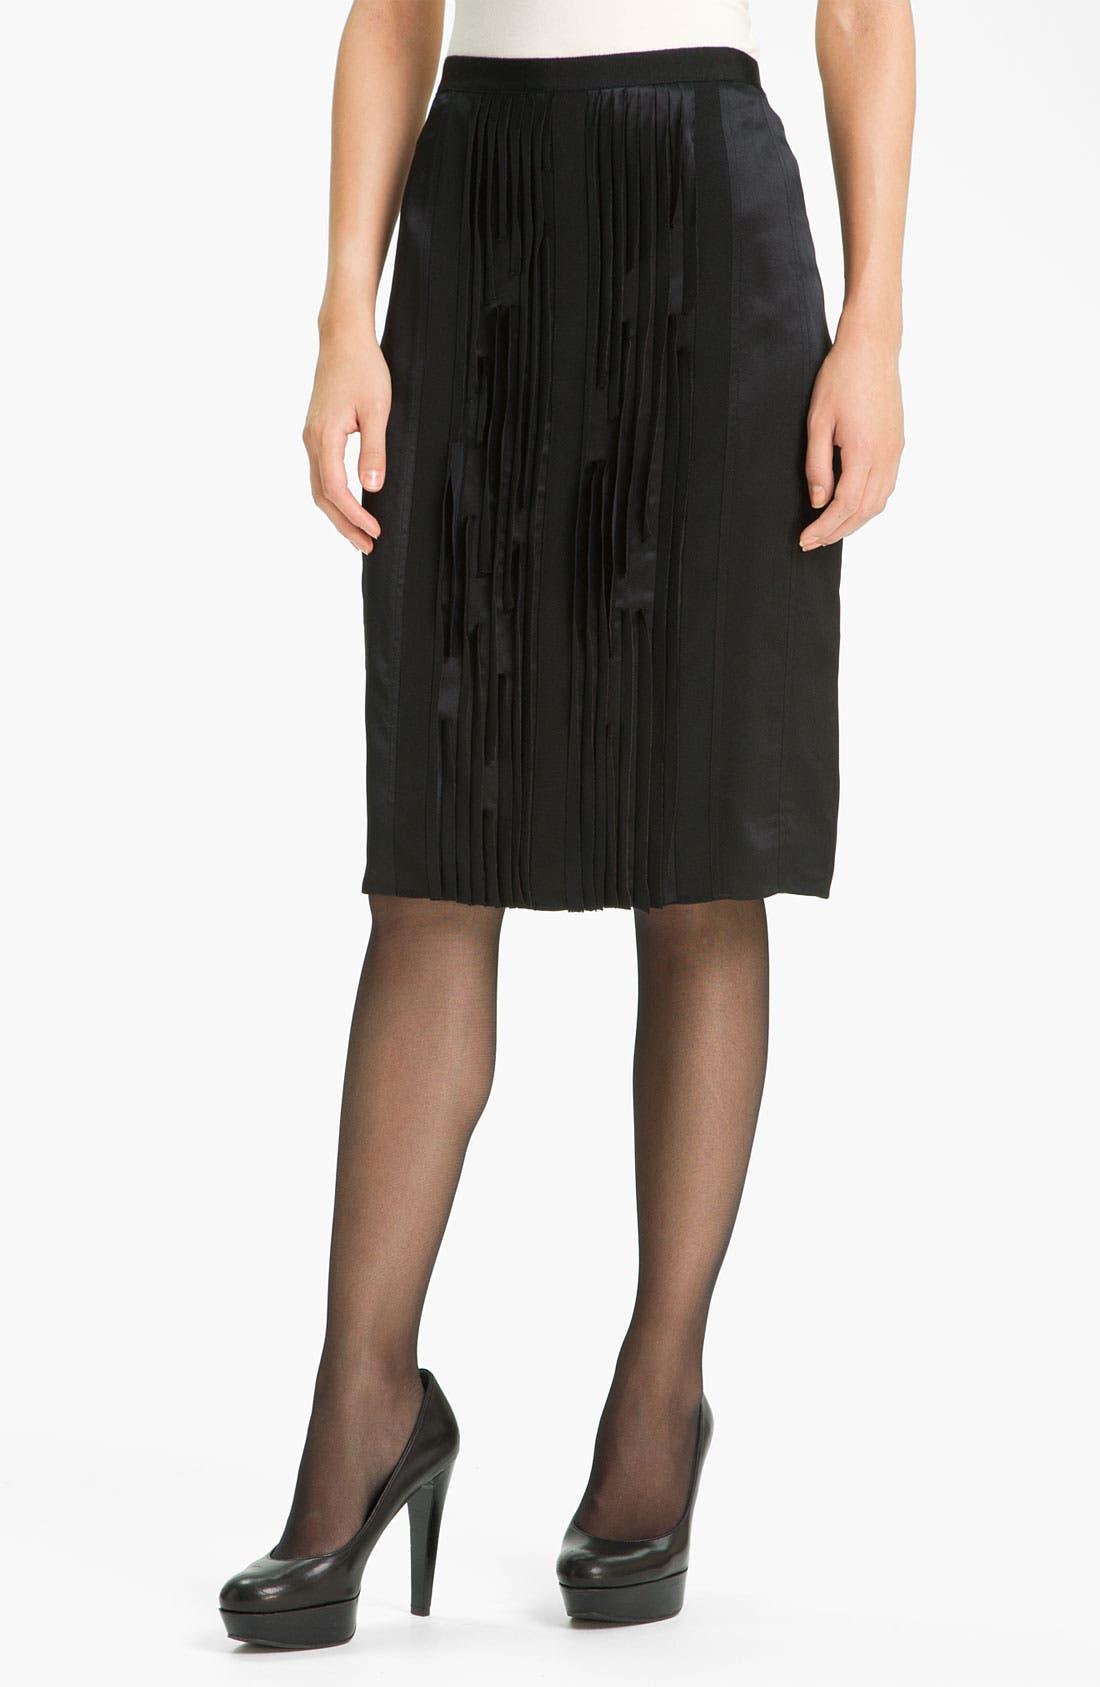 Alternate Image 1 Selected - Magaschoni Silk Charmeuse Skirt